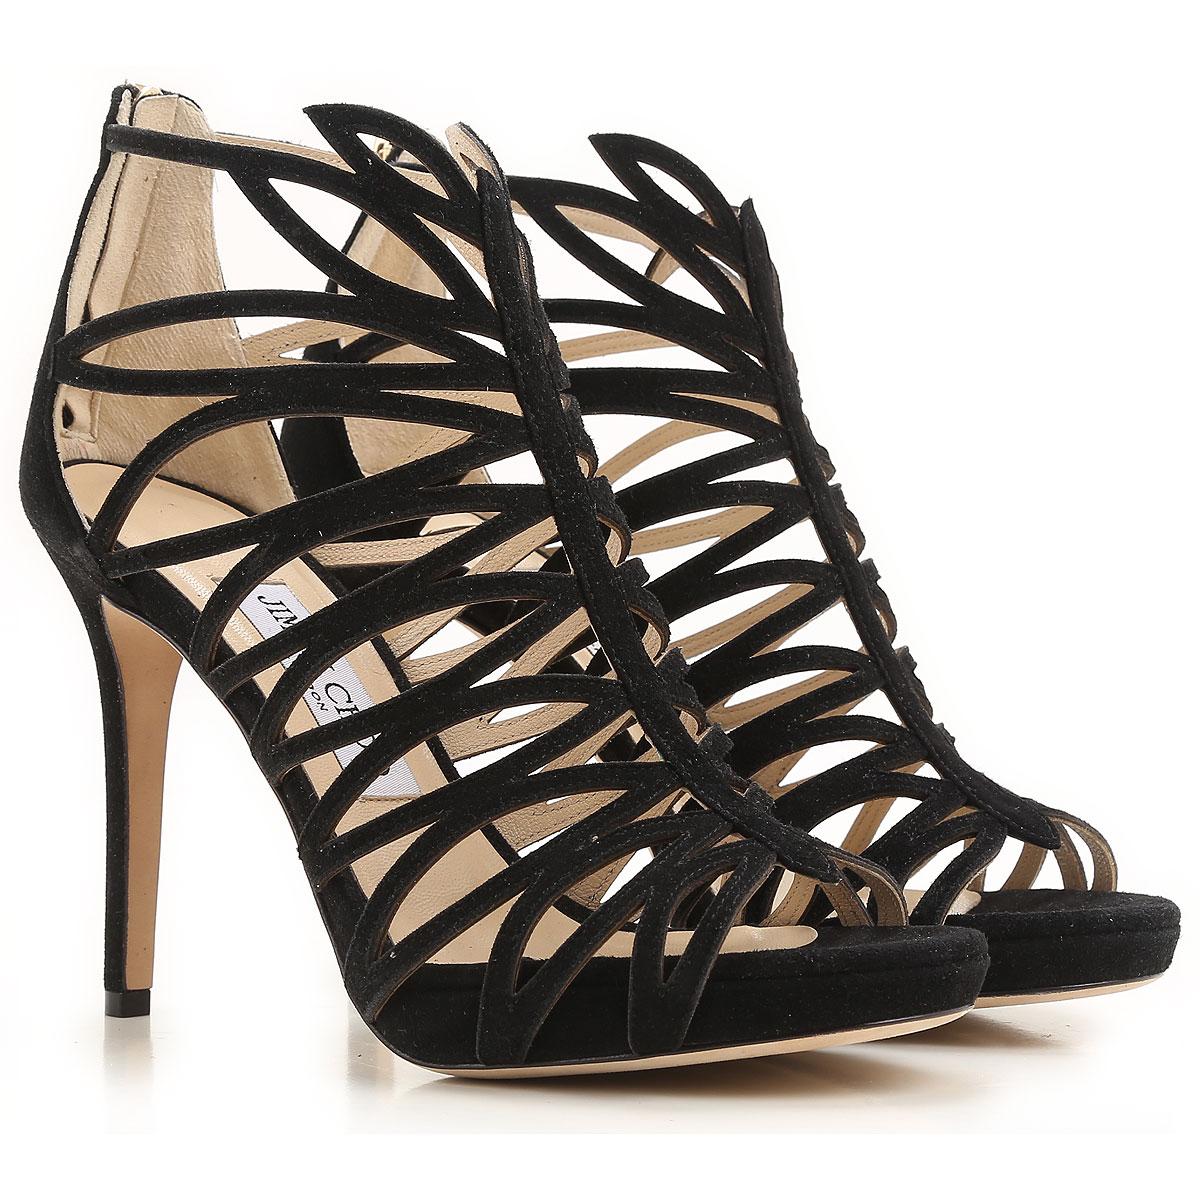 chaussures femme jimmy choo code produit kera 100 sue. Black Bedroom Furniture Sets. Home Design Ideas